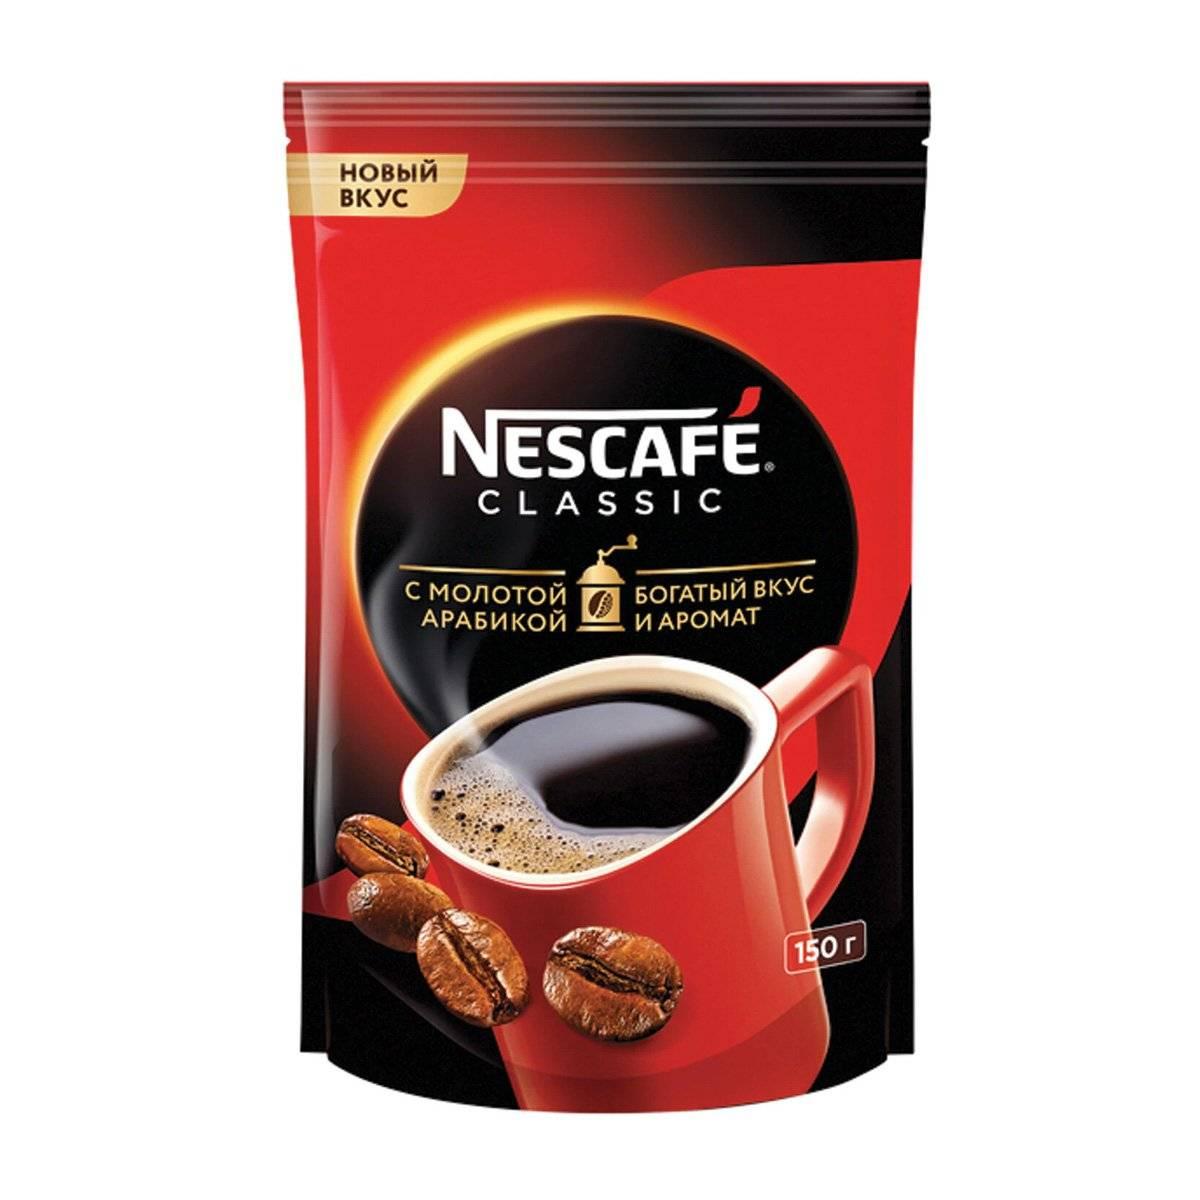 Ассортимент и характеристики кофе нескафе